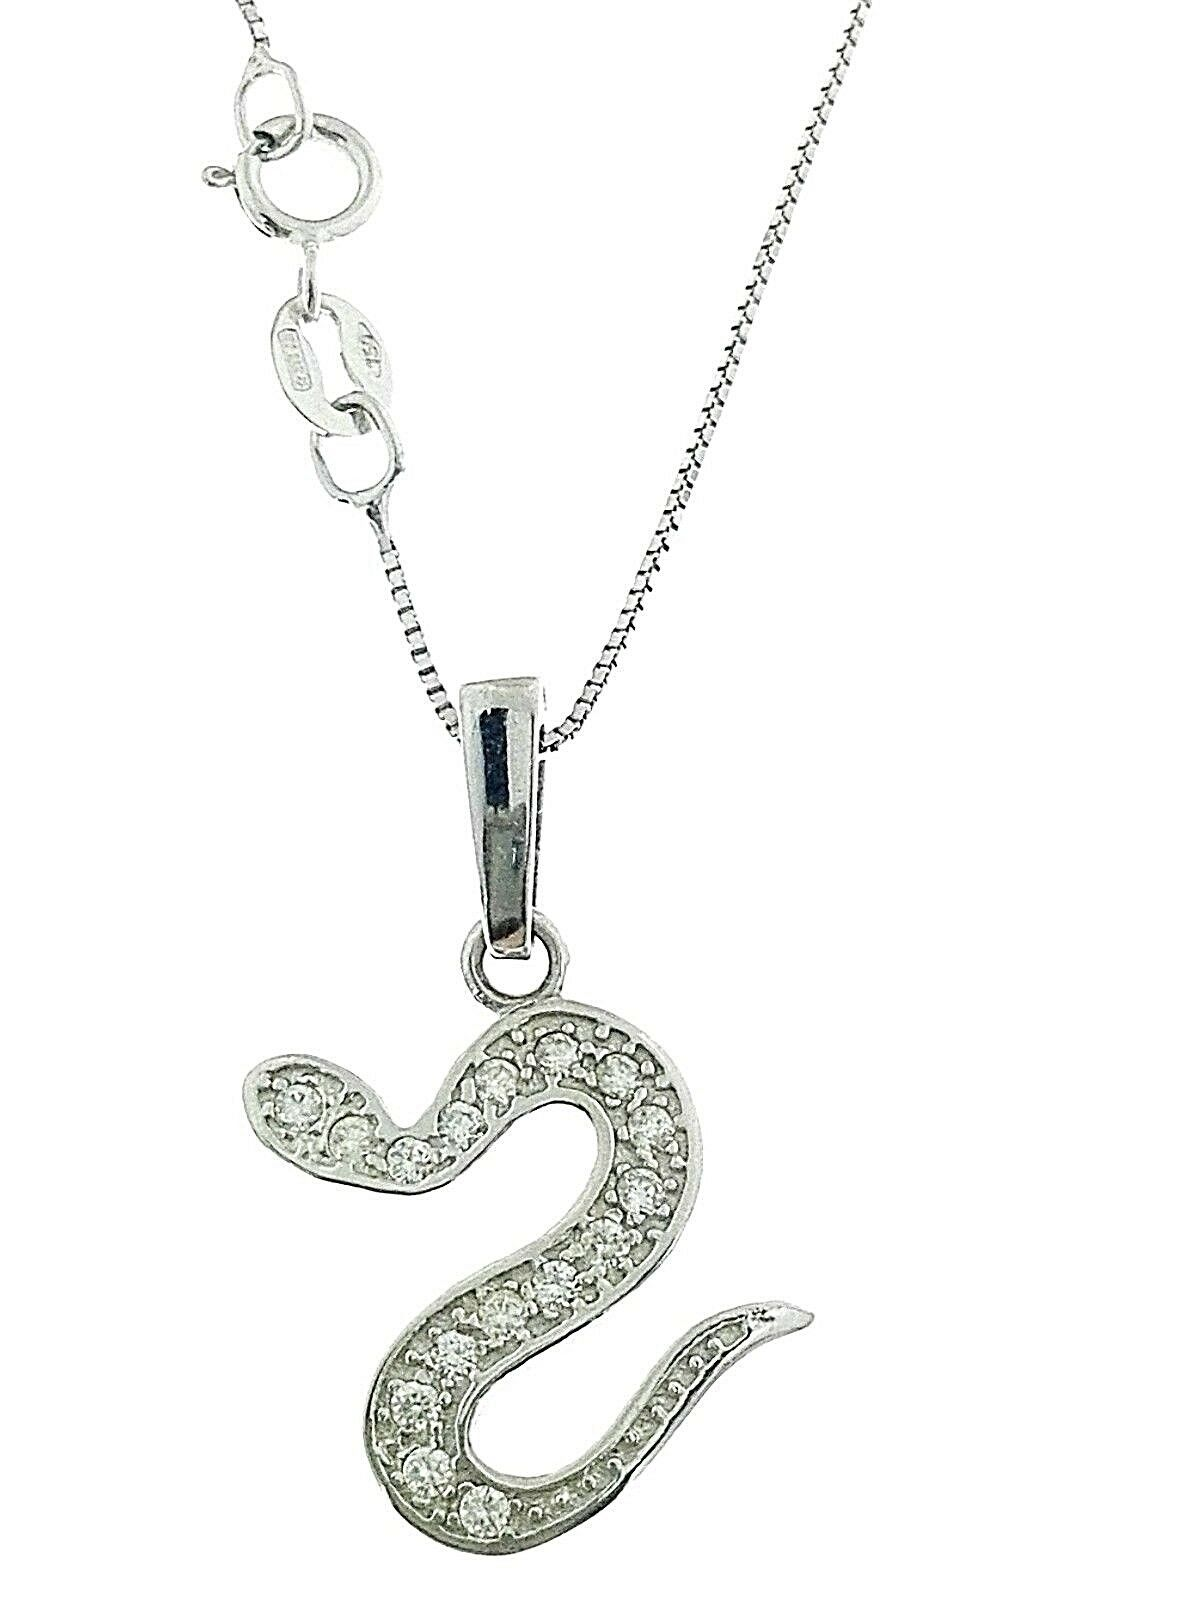 Collana Catenina Serpente Serpentel Donna oro Bianco 18 18 18 Kt Carati Ct 750 2 40 Gr 775574